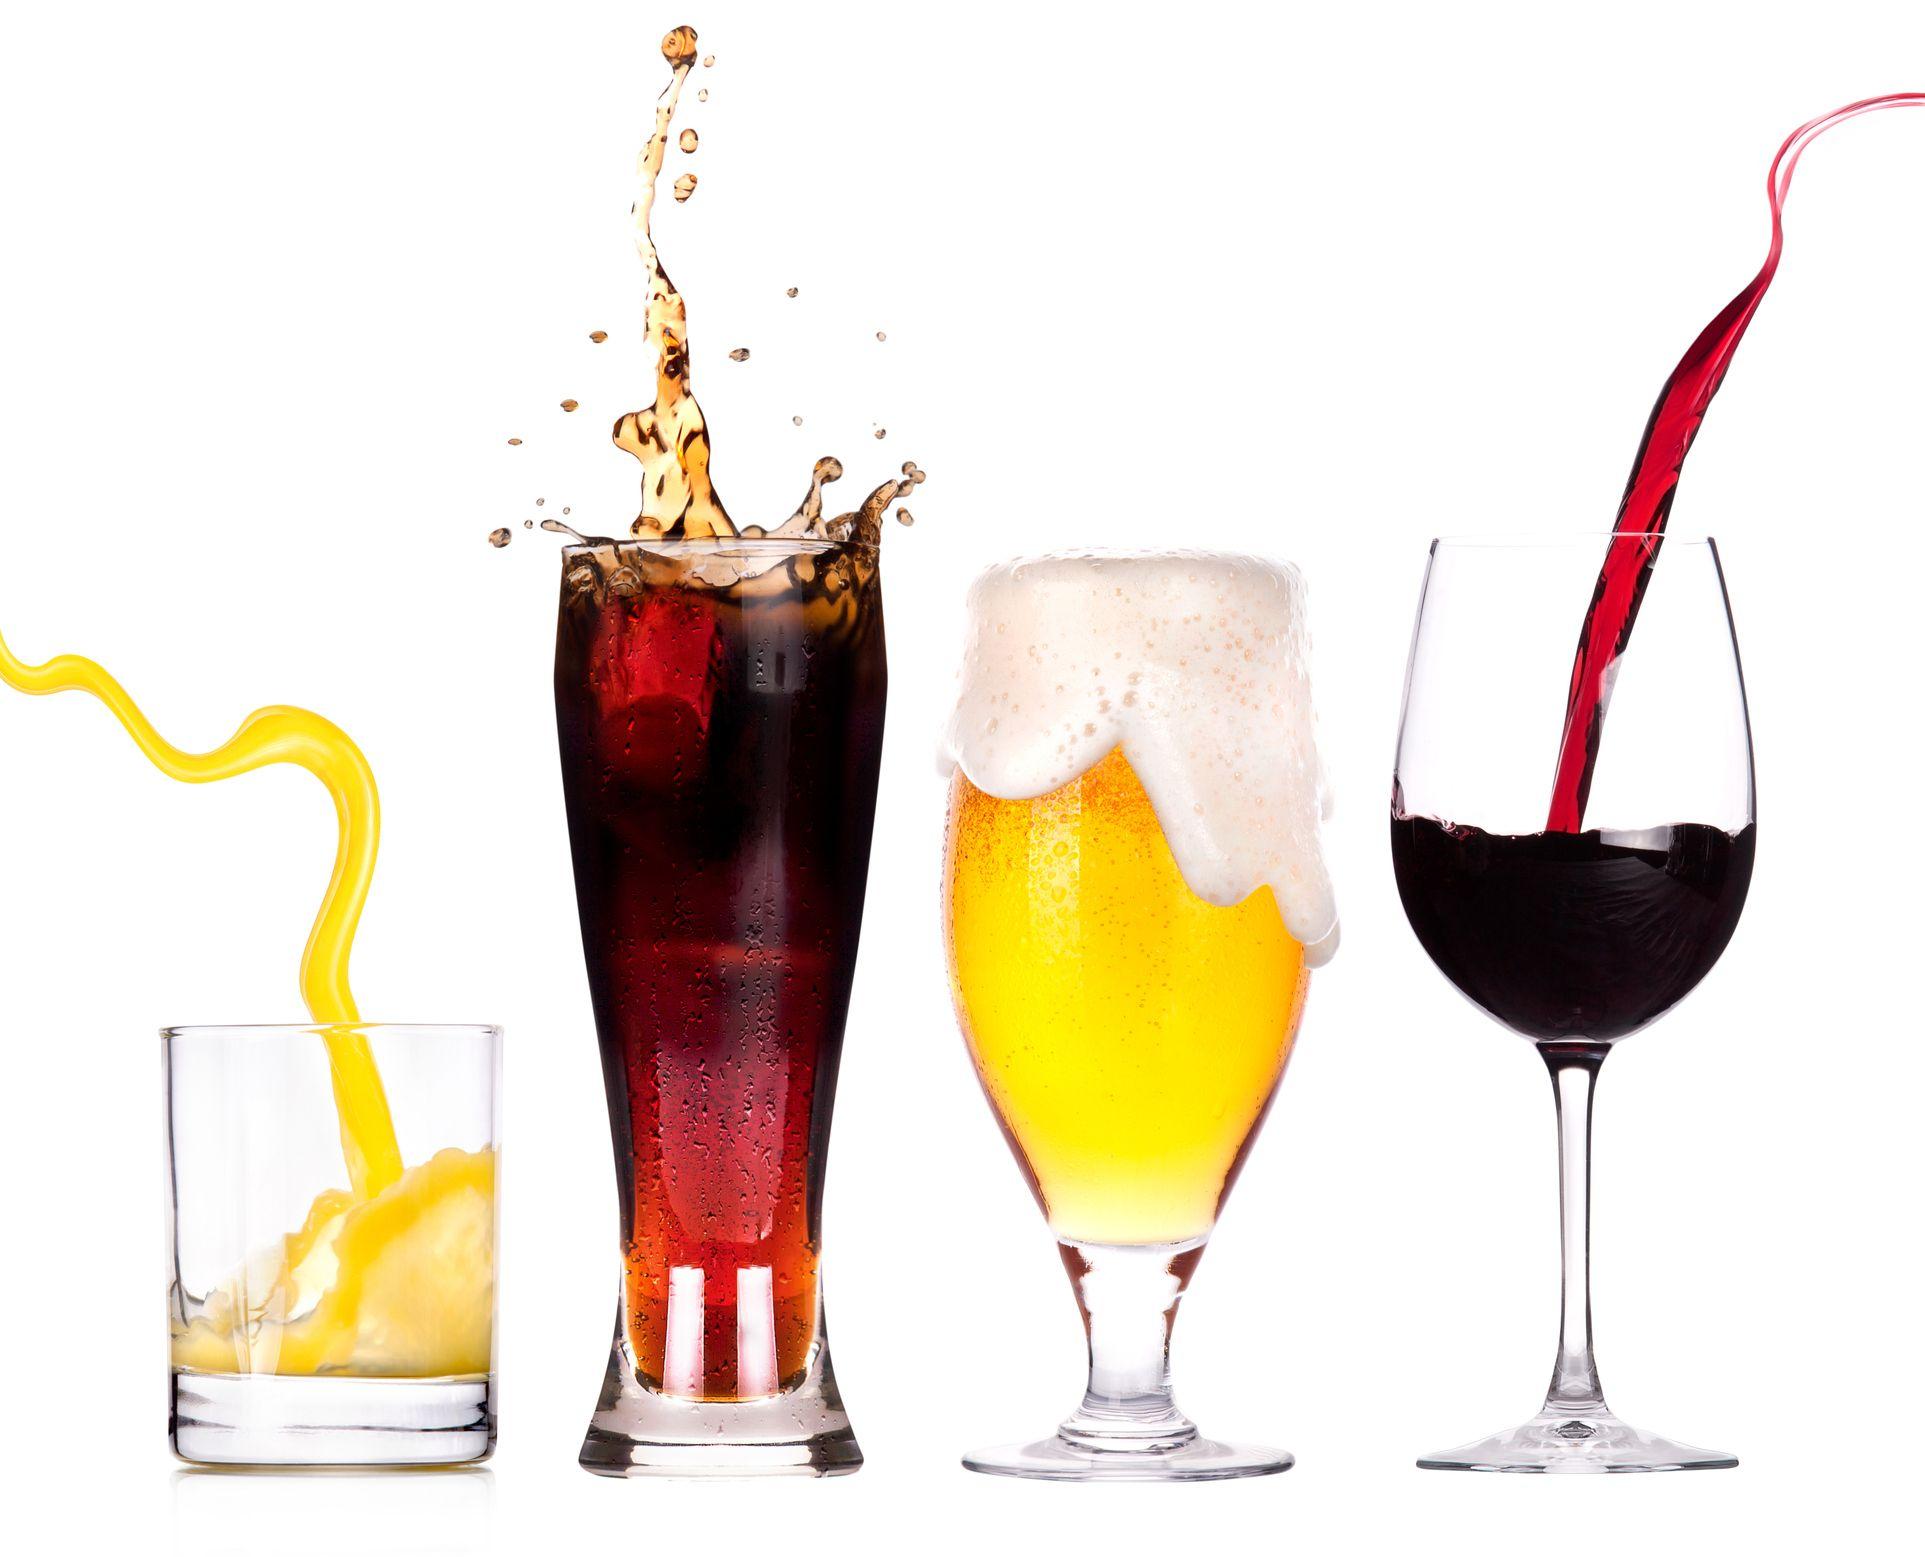 drink-alcohol-wine-booze-stock